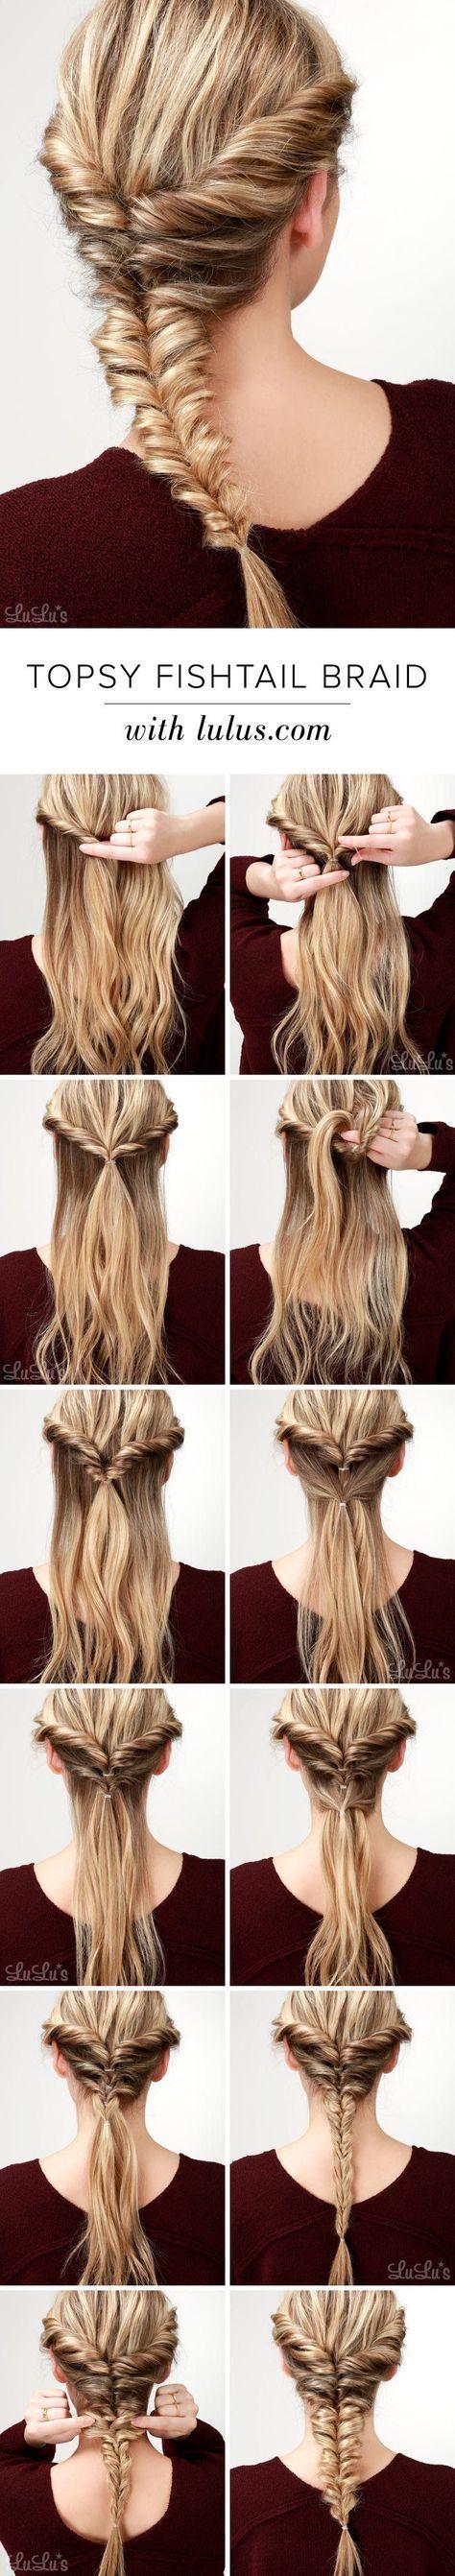 bathbomb Fishtail braids prefect for a...